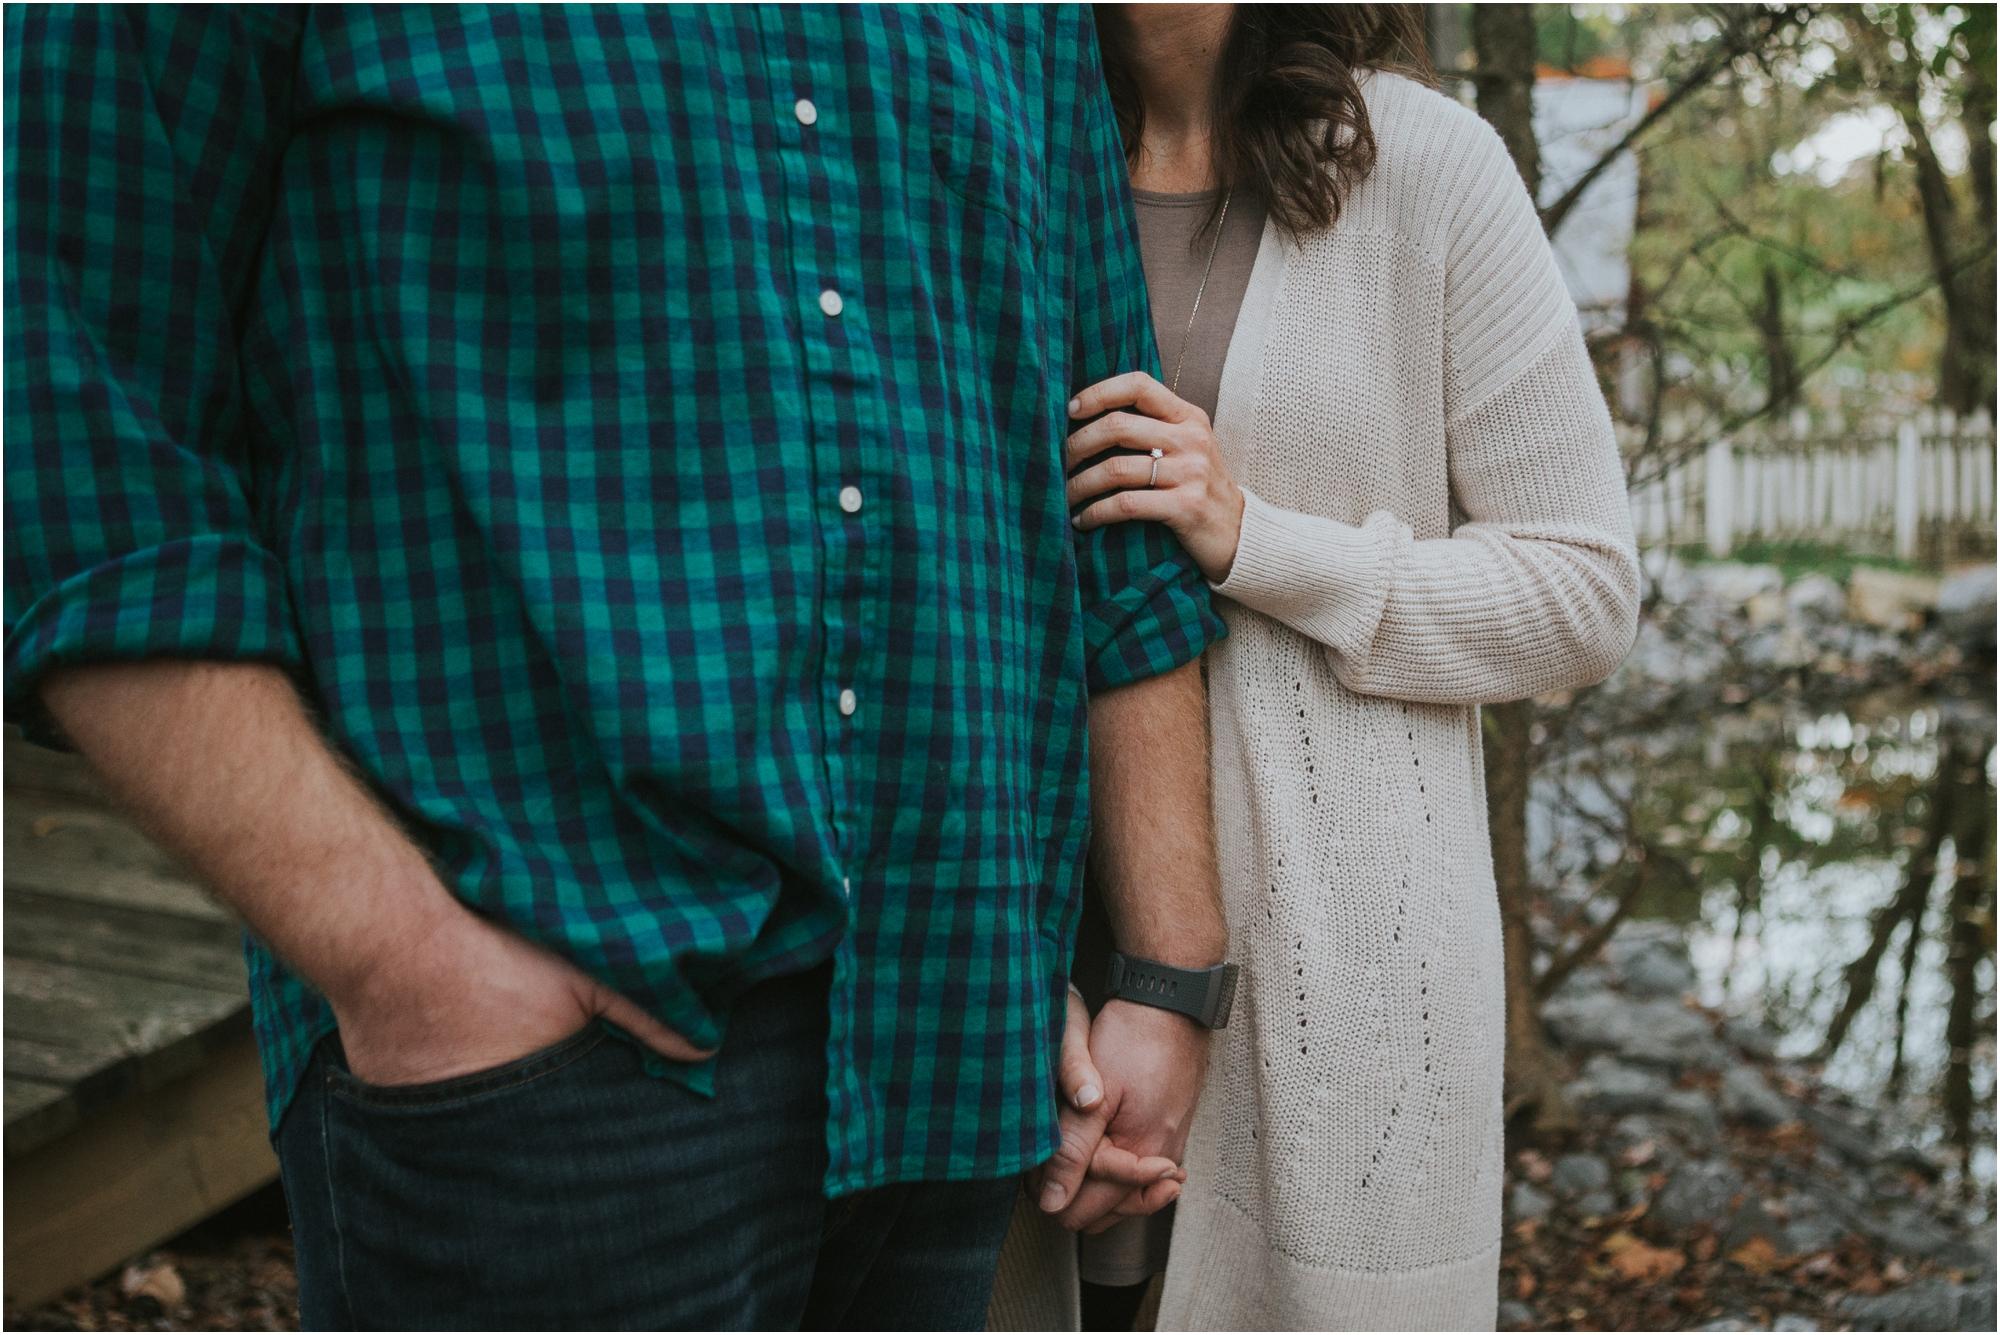 katy-sergent-millstone-limestone-tn-rustic-fall-engagement-session-adventurous-outdoors-intimate-elopement-wedding-northeast-johnson-city-photographer_0034.jpg